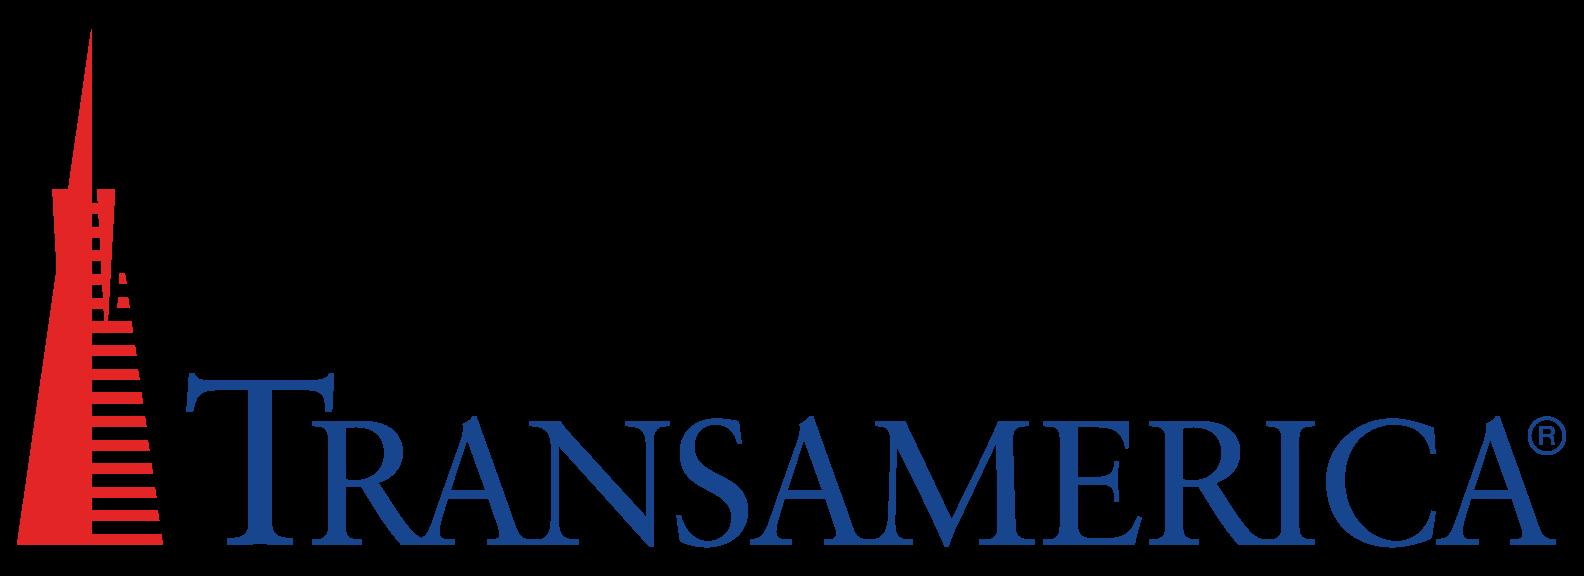 transamerica_logo